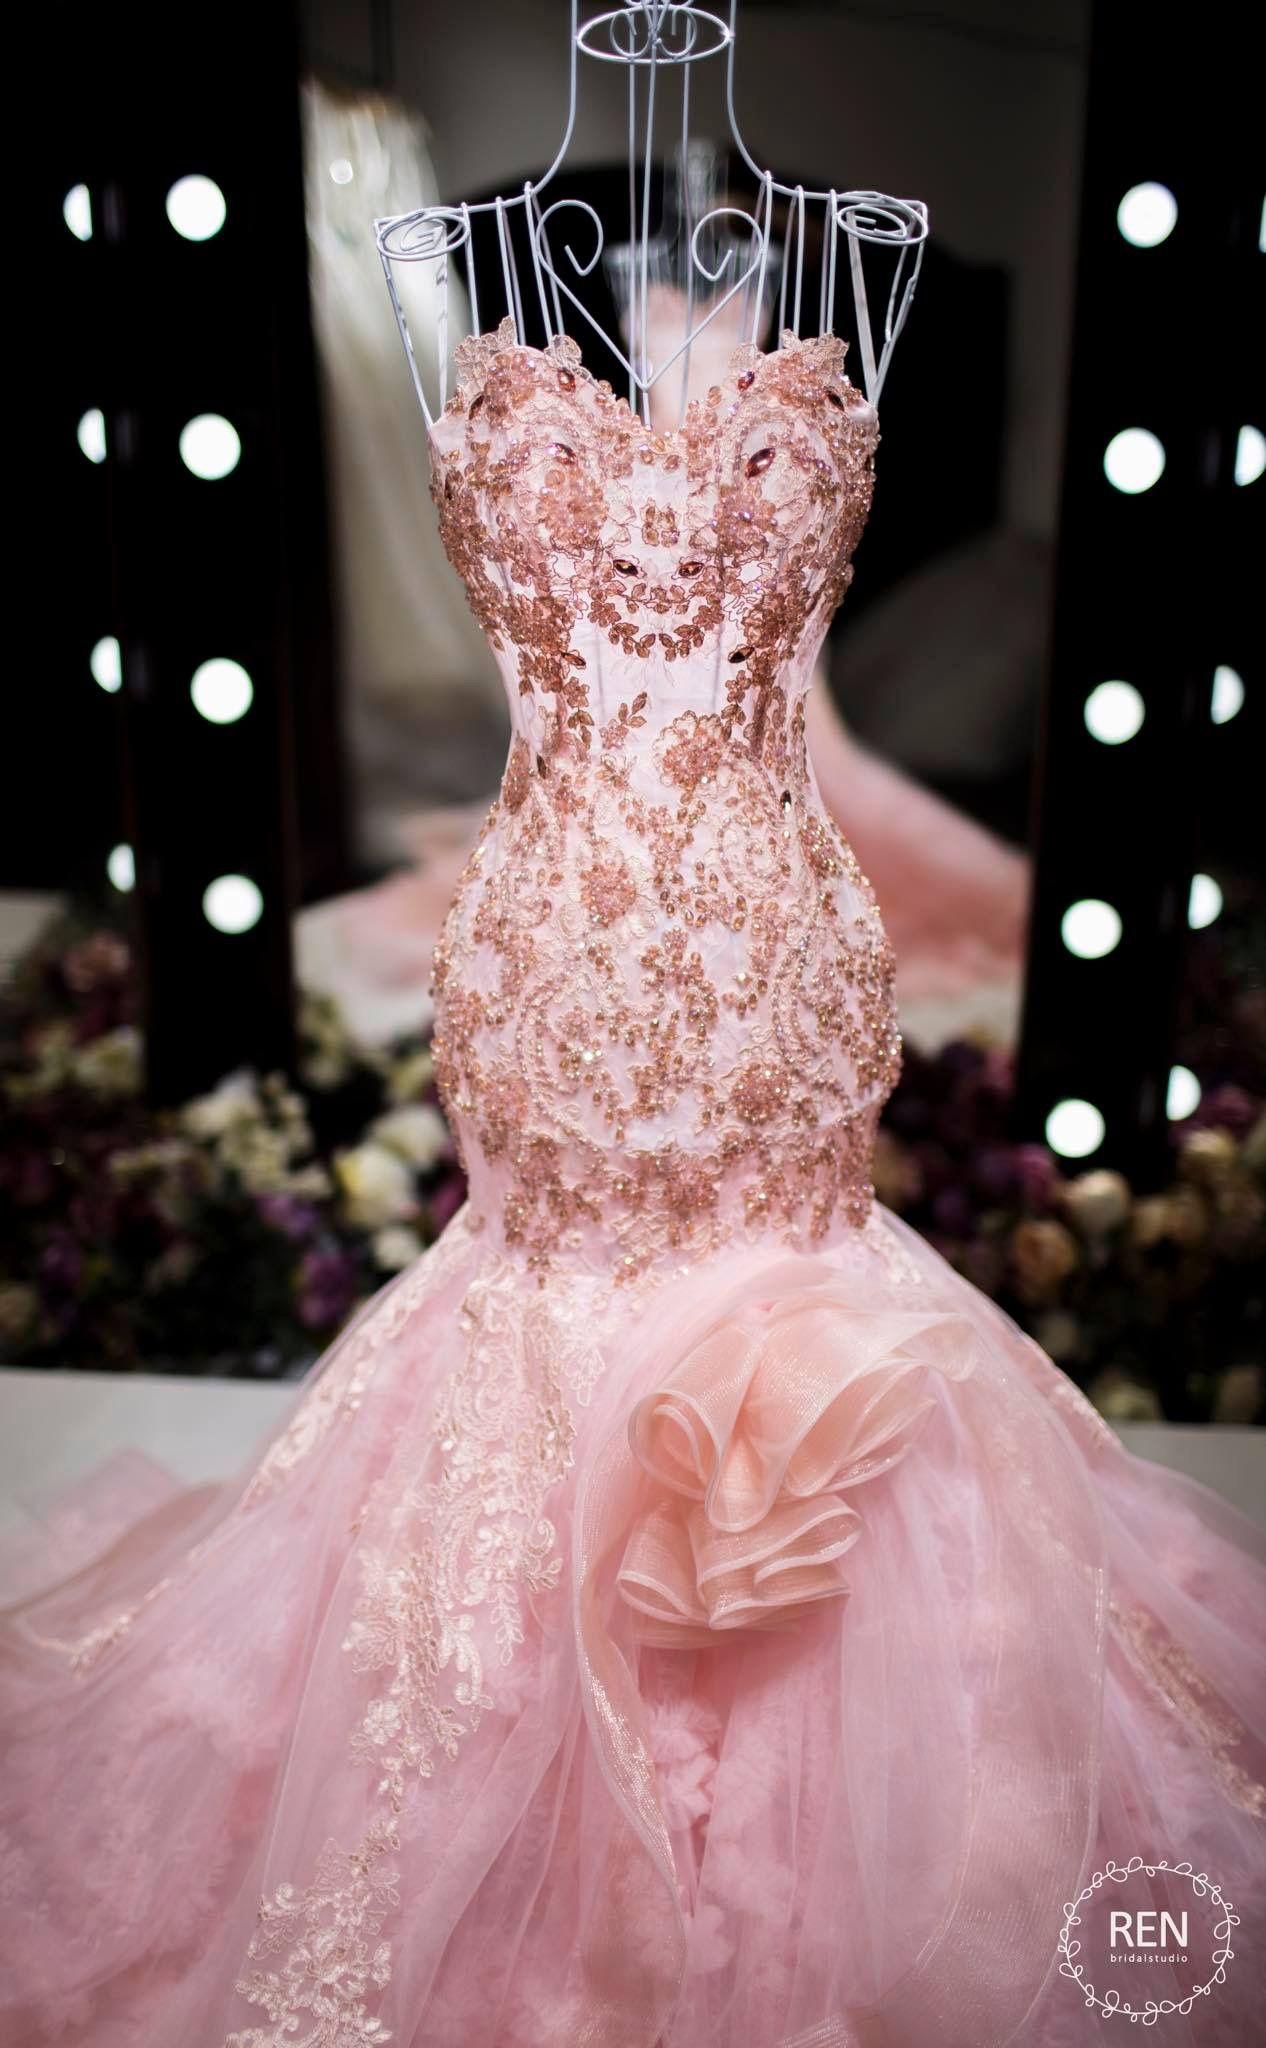 Pin de Helen en Pretty dresses | Pinterest | Vestido de quince ...